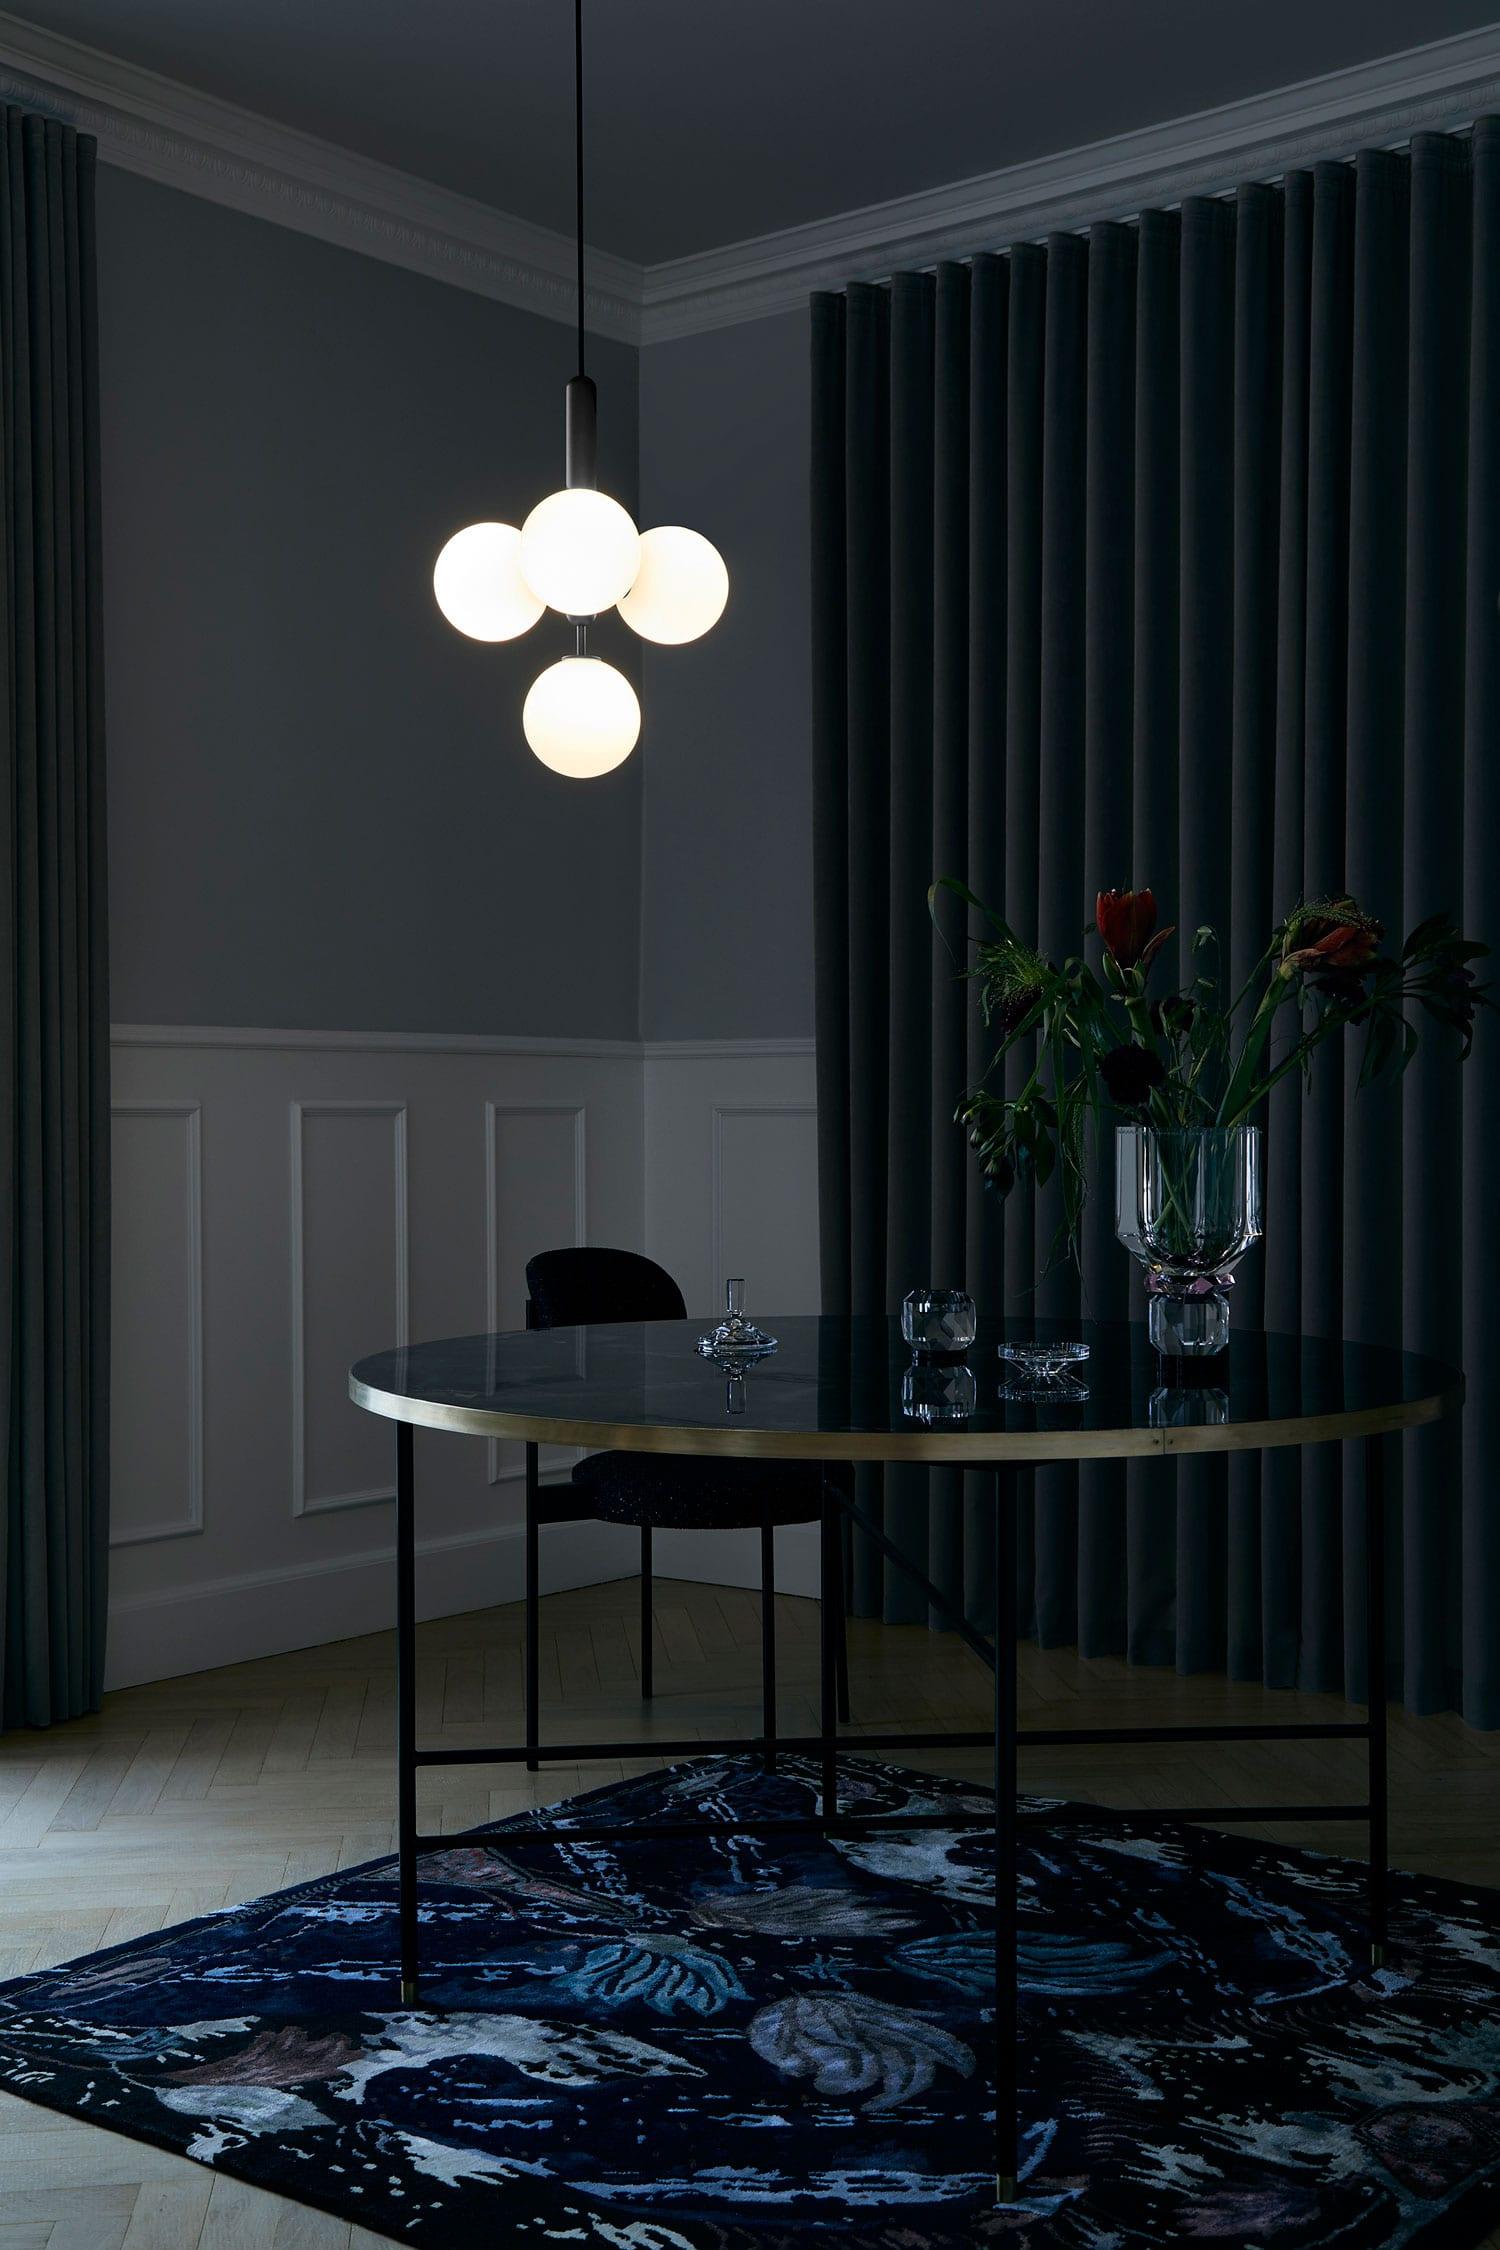 Nuura Miira at Stockholm Furniture Fair 2018 | Yellowtrace